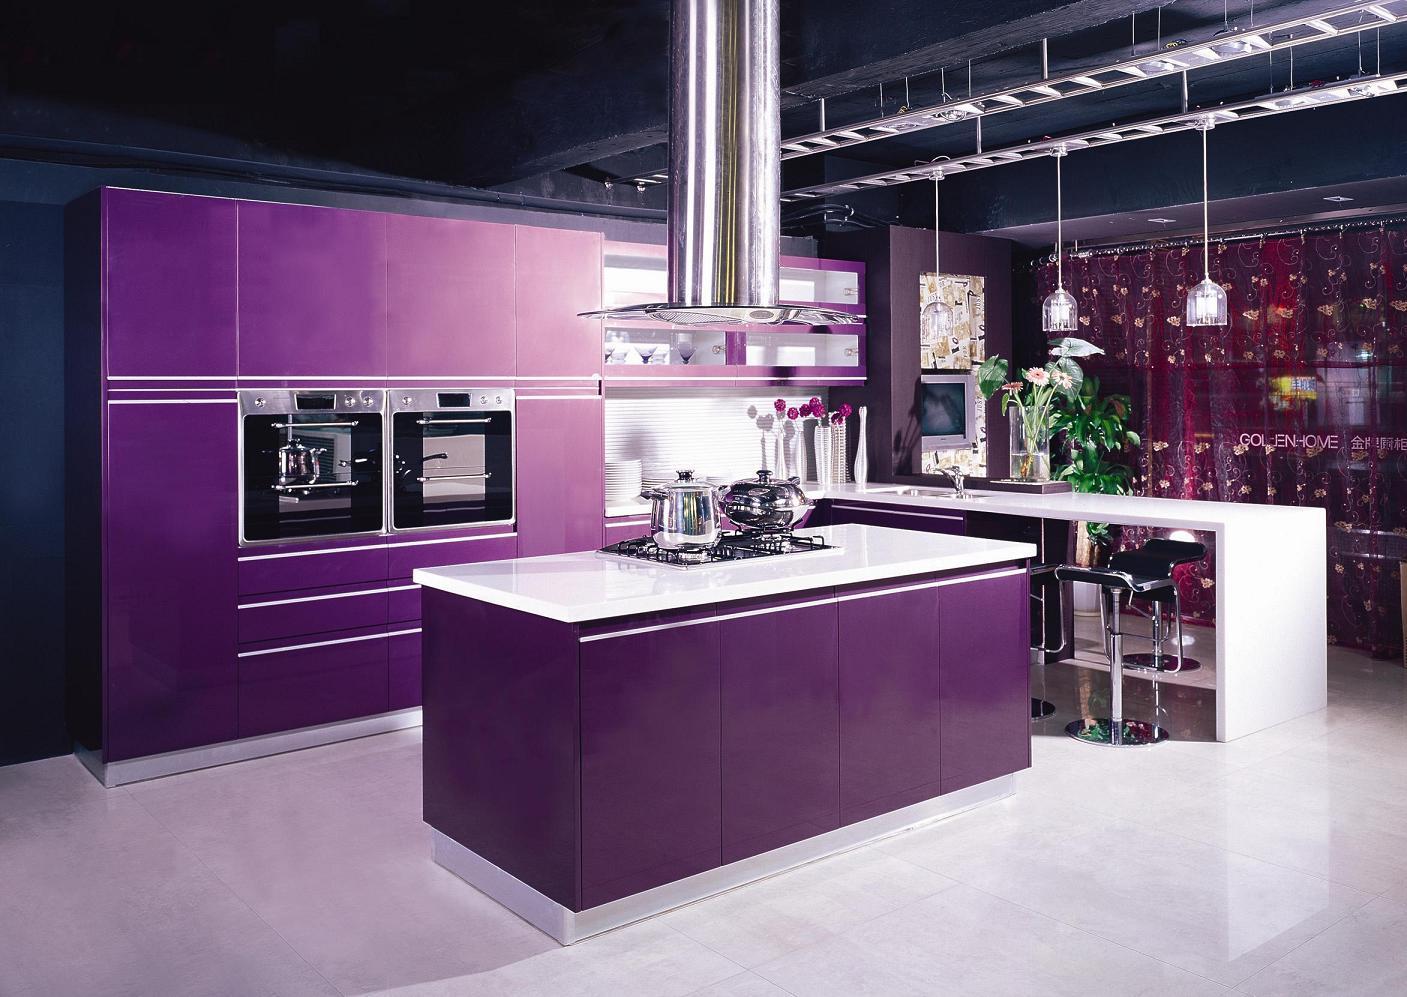 Mobilier violet bucatarie deschisa